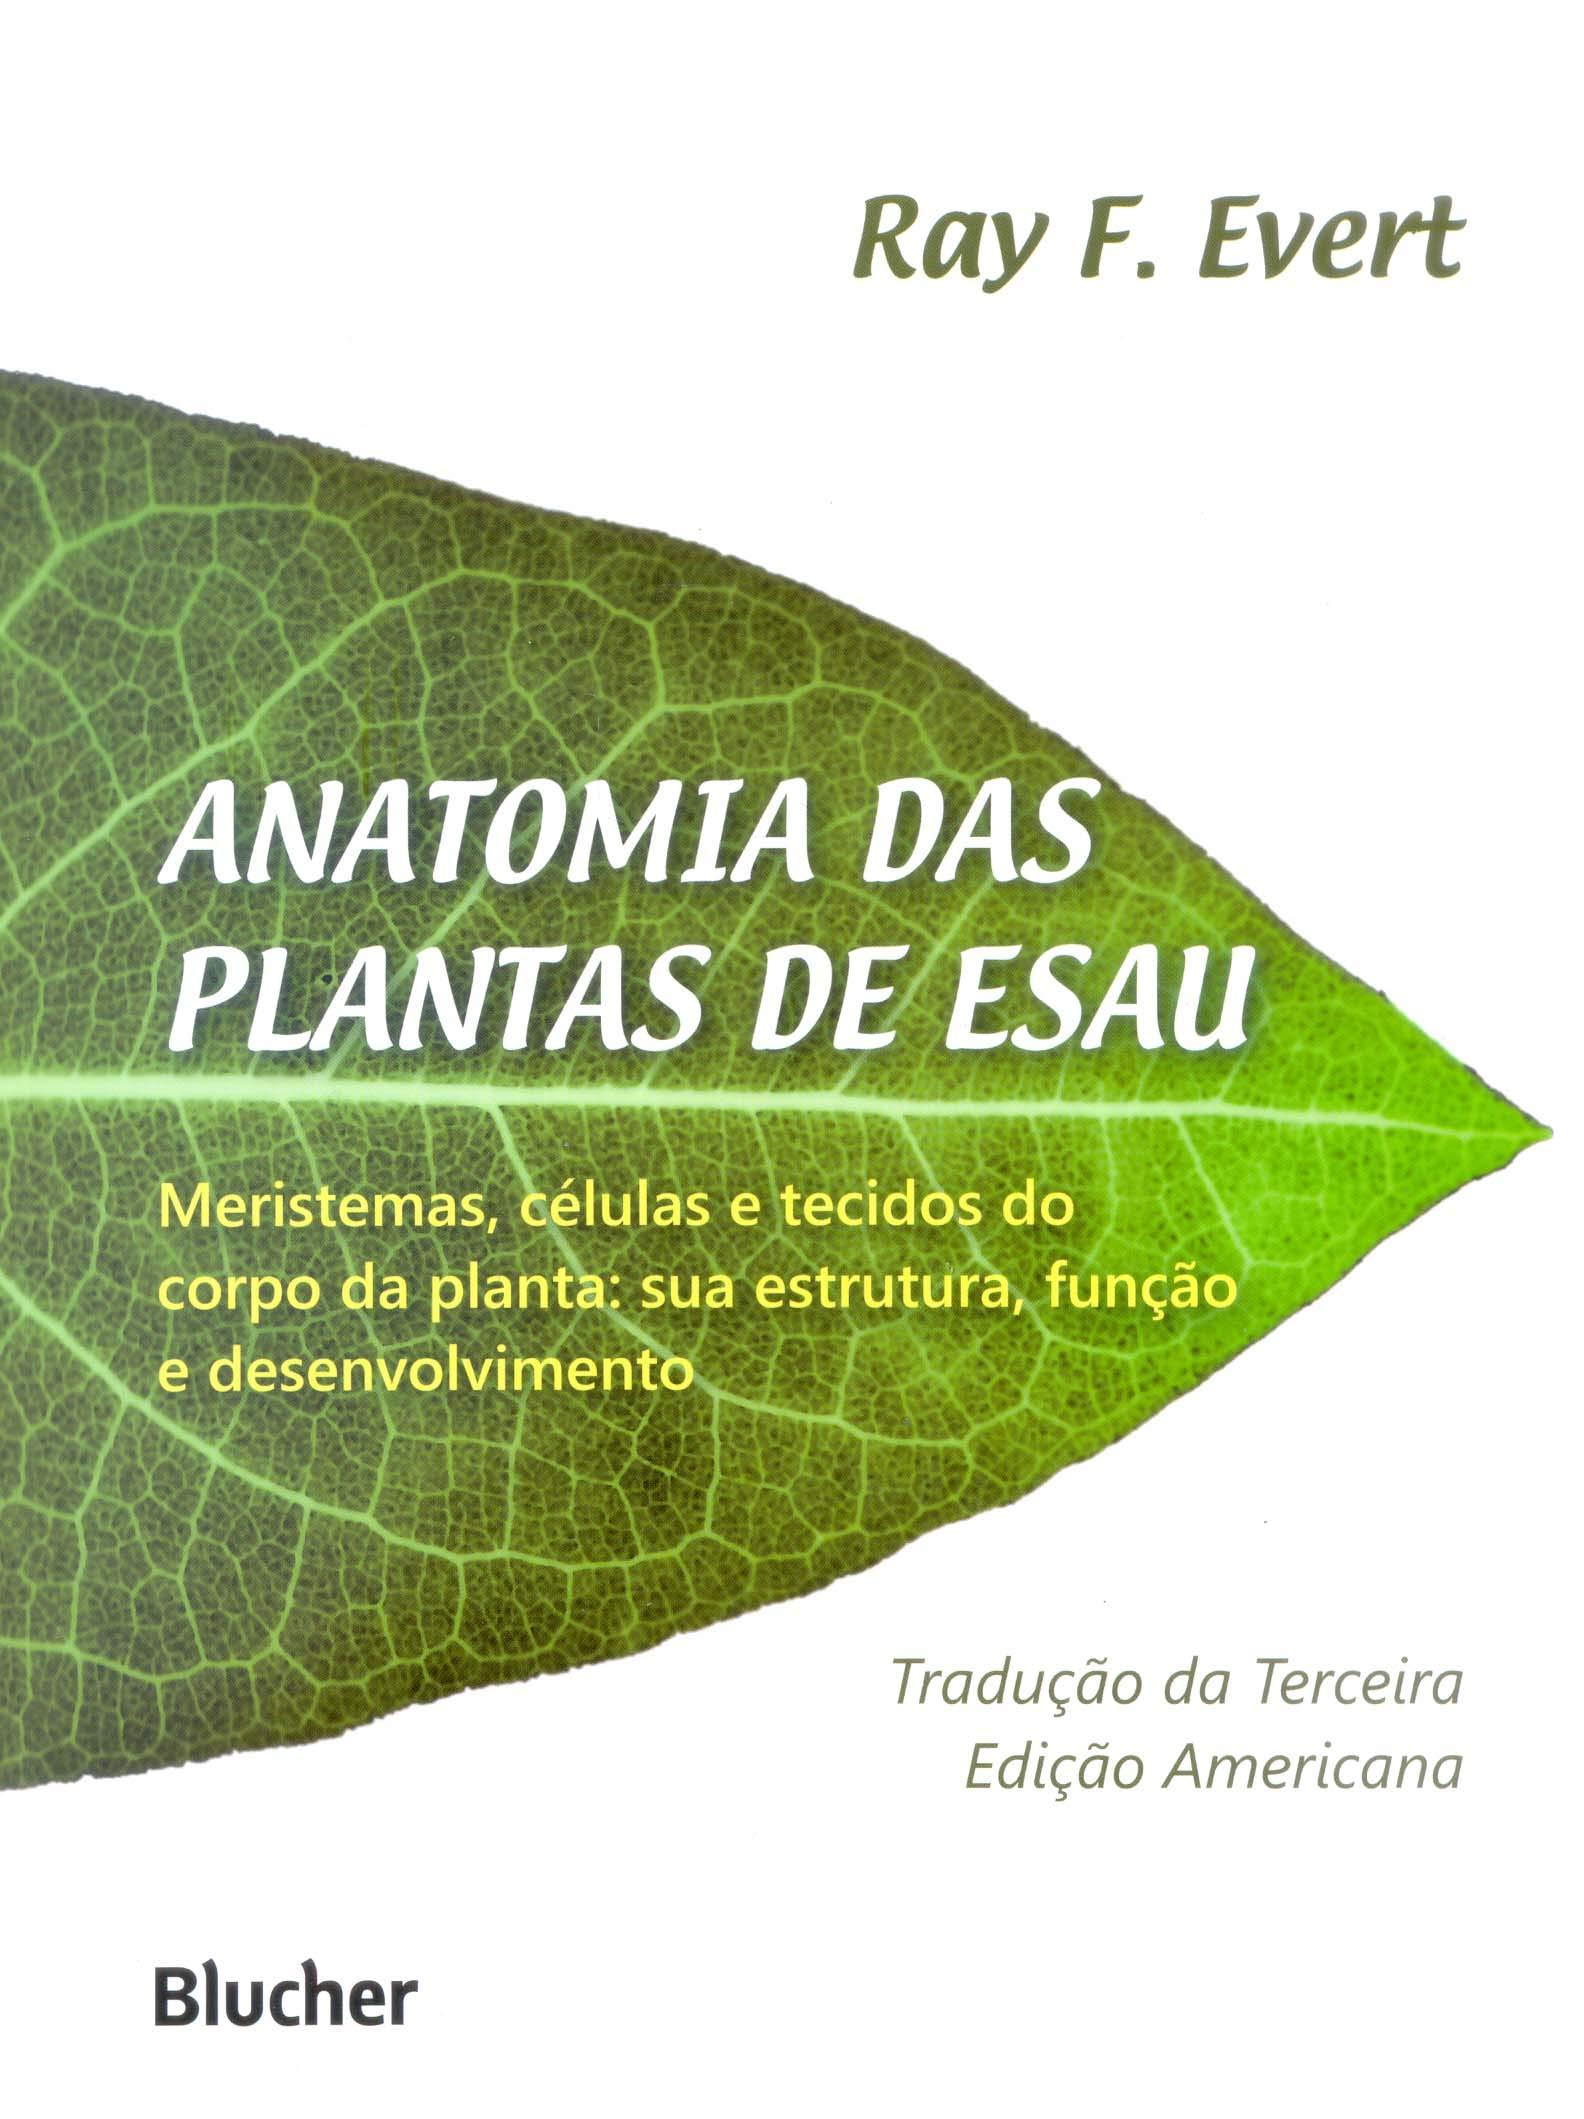 Anatomia das Plantas de Esau Em Portuguese do Brasil: Amazon.es: Ray ...